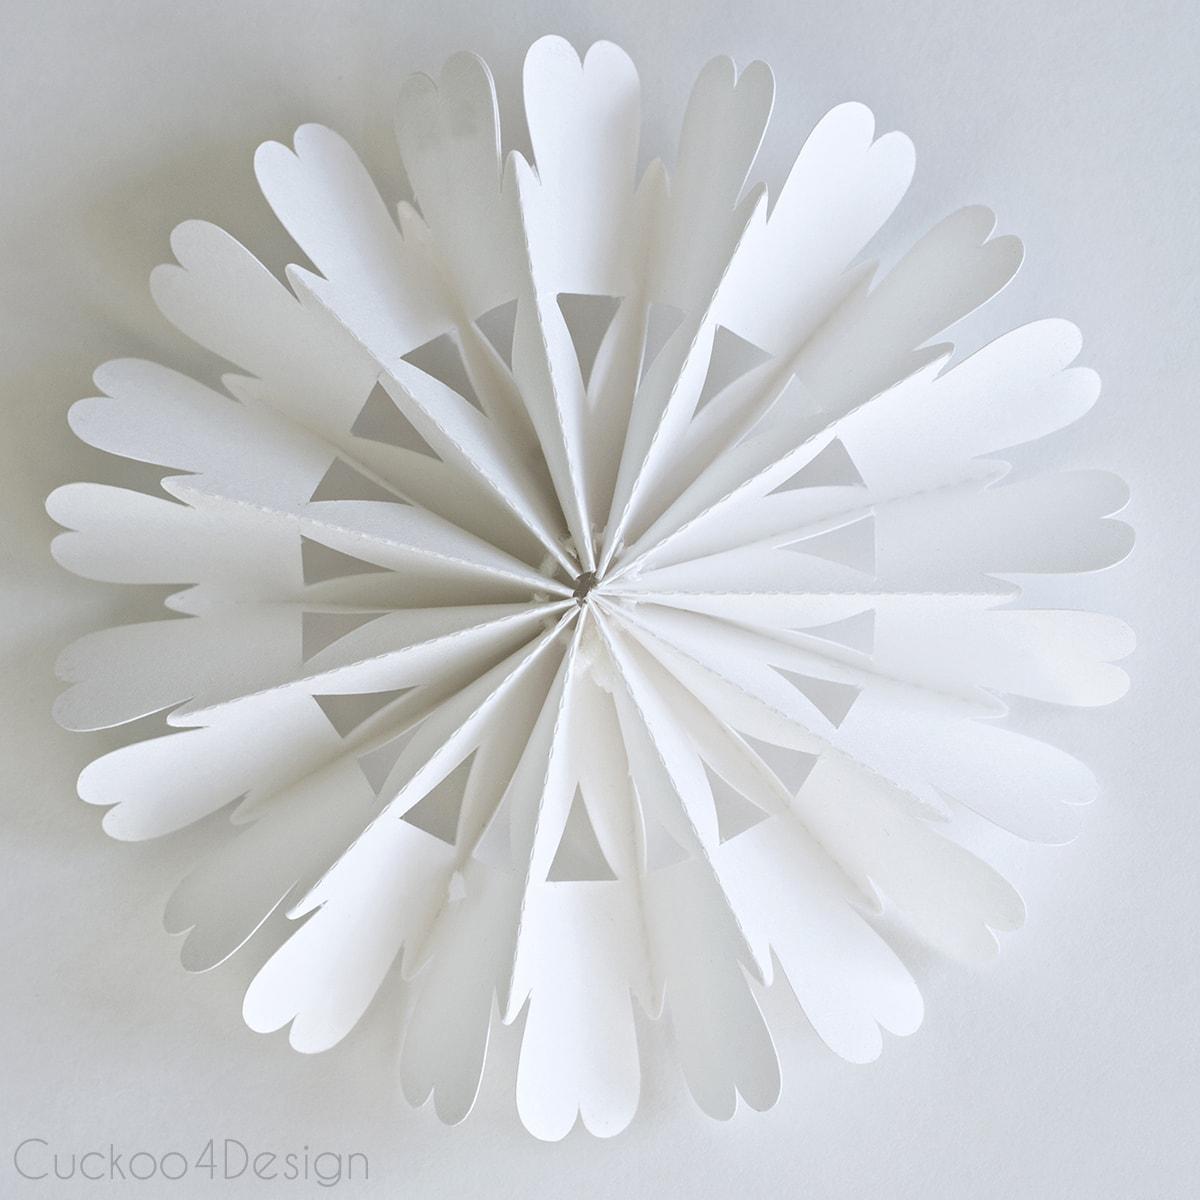 diy_cardboard_snowflake_ornament_cuckoo4design_4